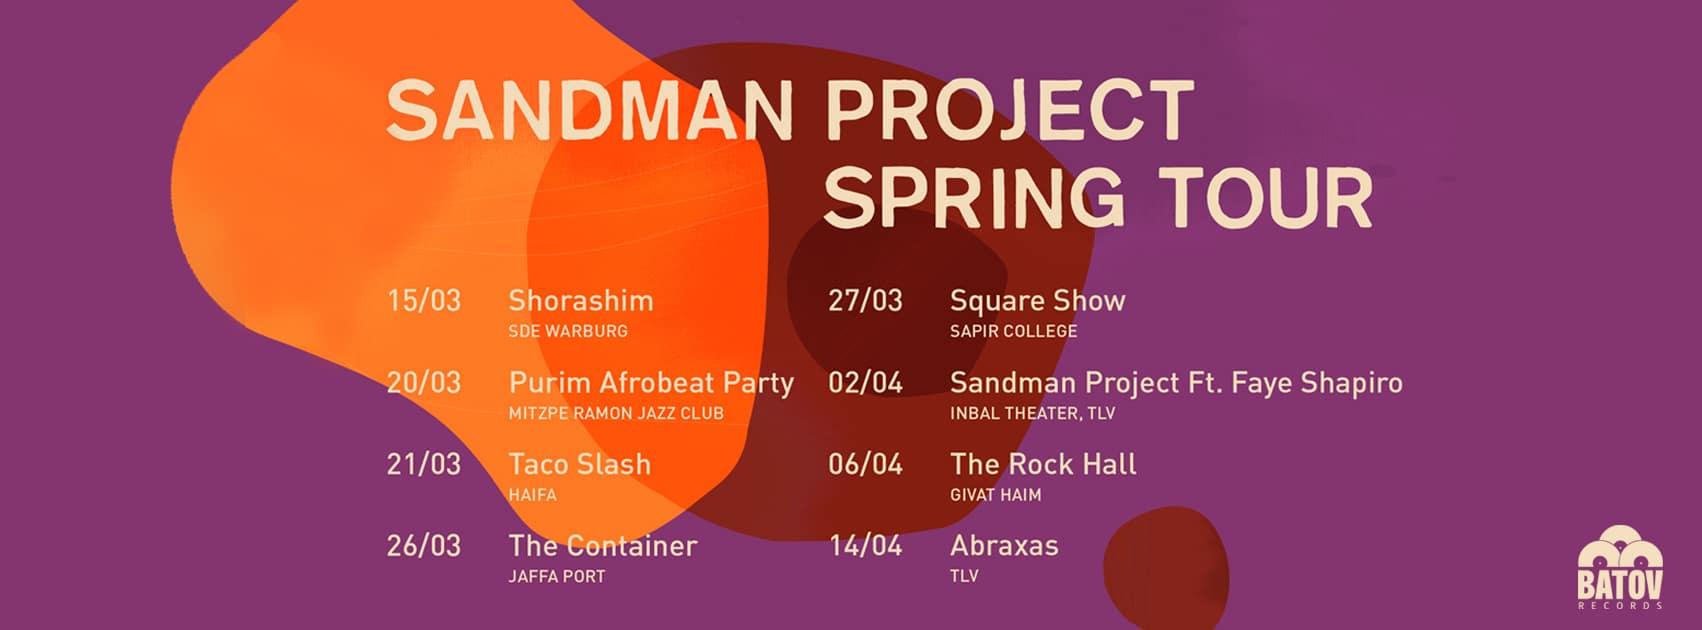 Sandman Project Spring Tour 2019 2